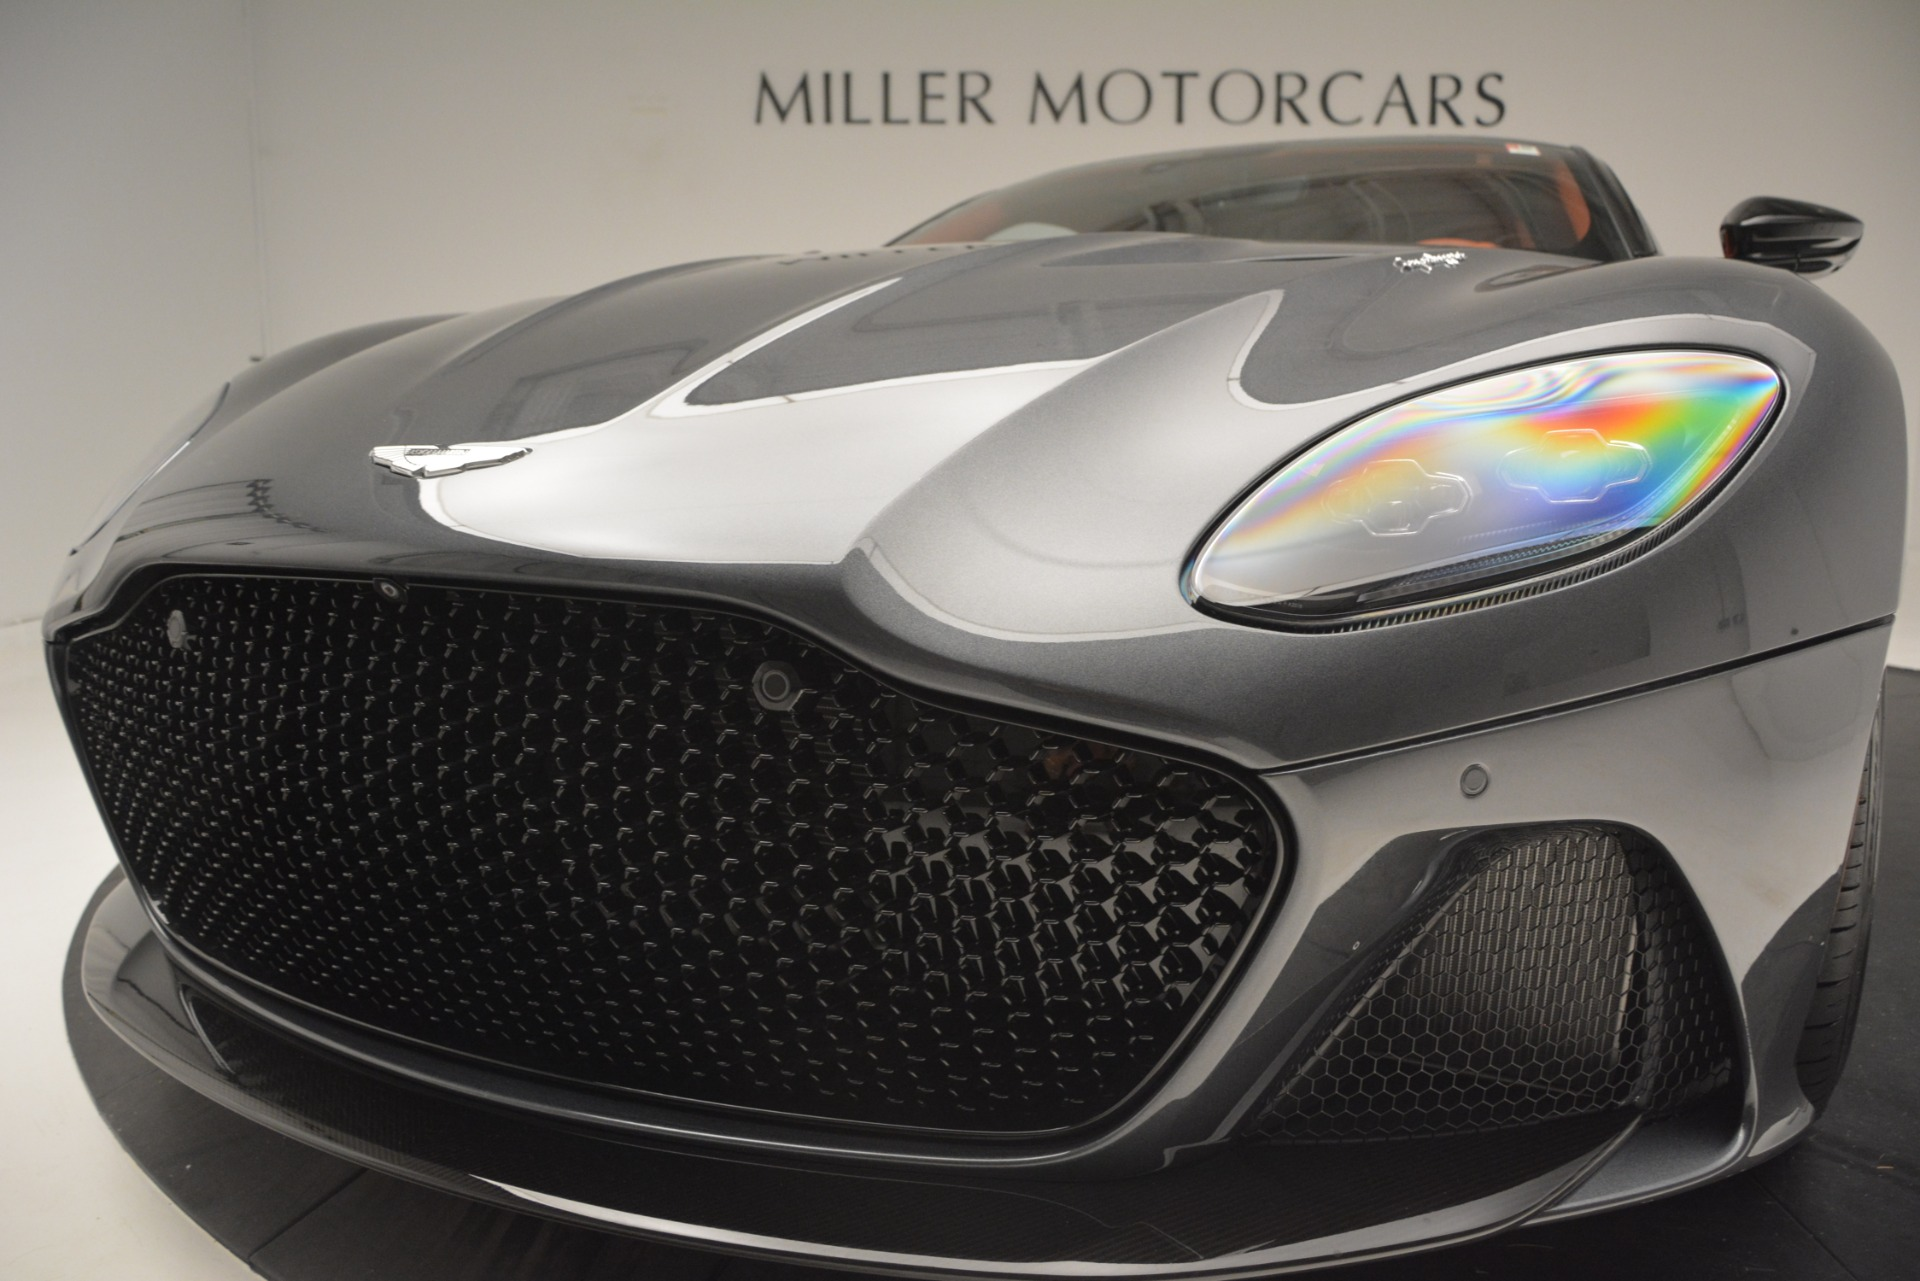 New 2019 Aston Martin DBS Superleggera For Sale In Greenwich, CT 2827_p14